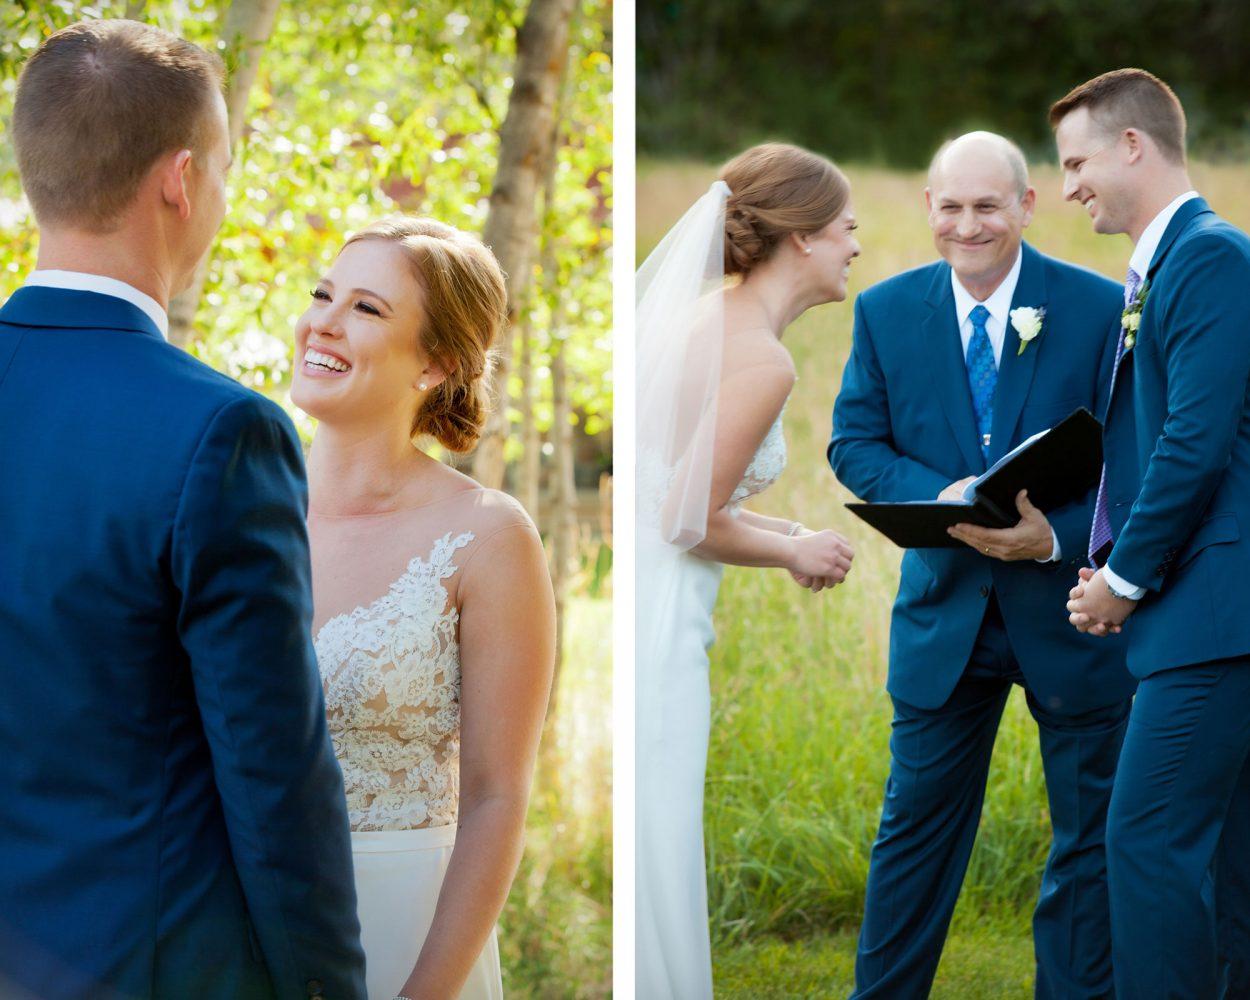 Getting married outdoors. A backyard wedding in Durango, Colorado